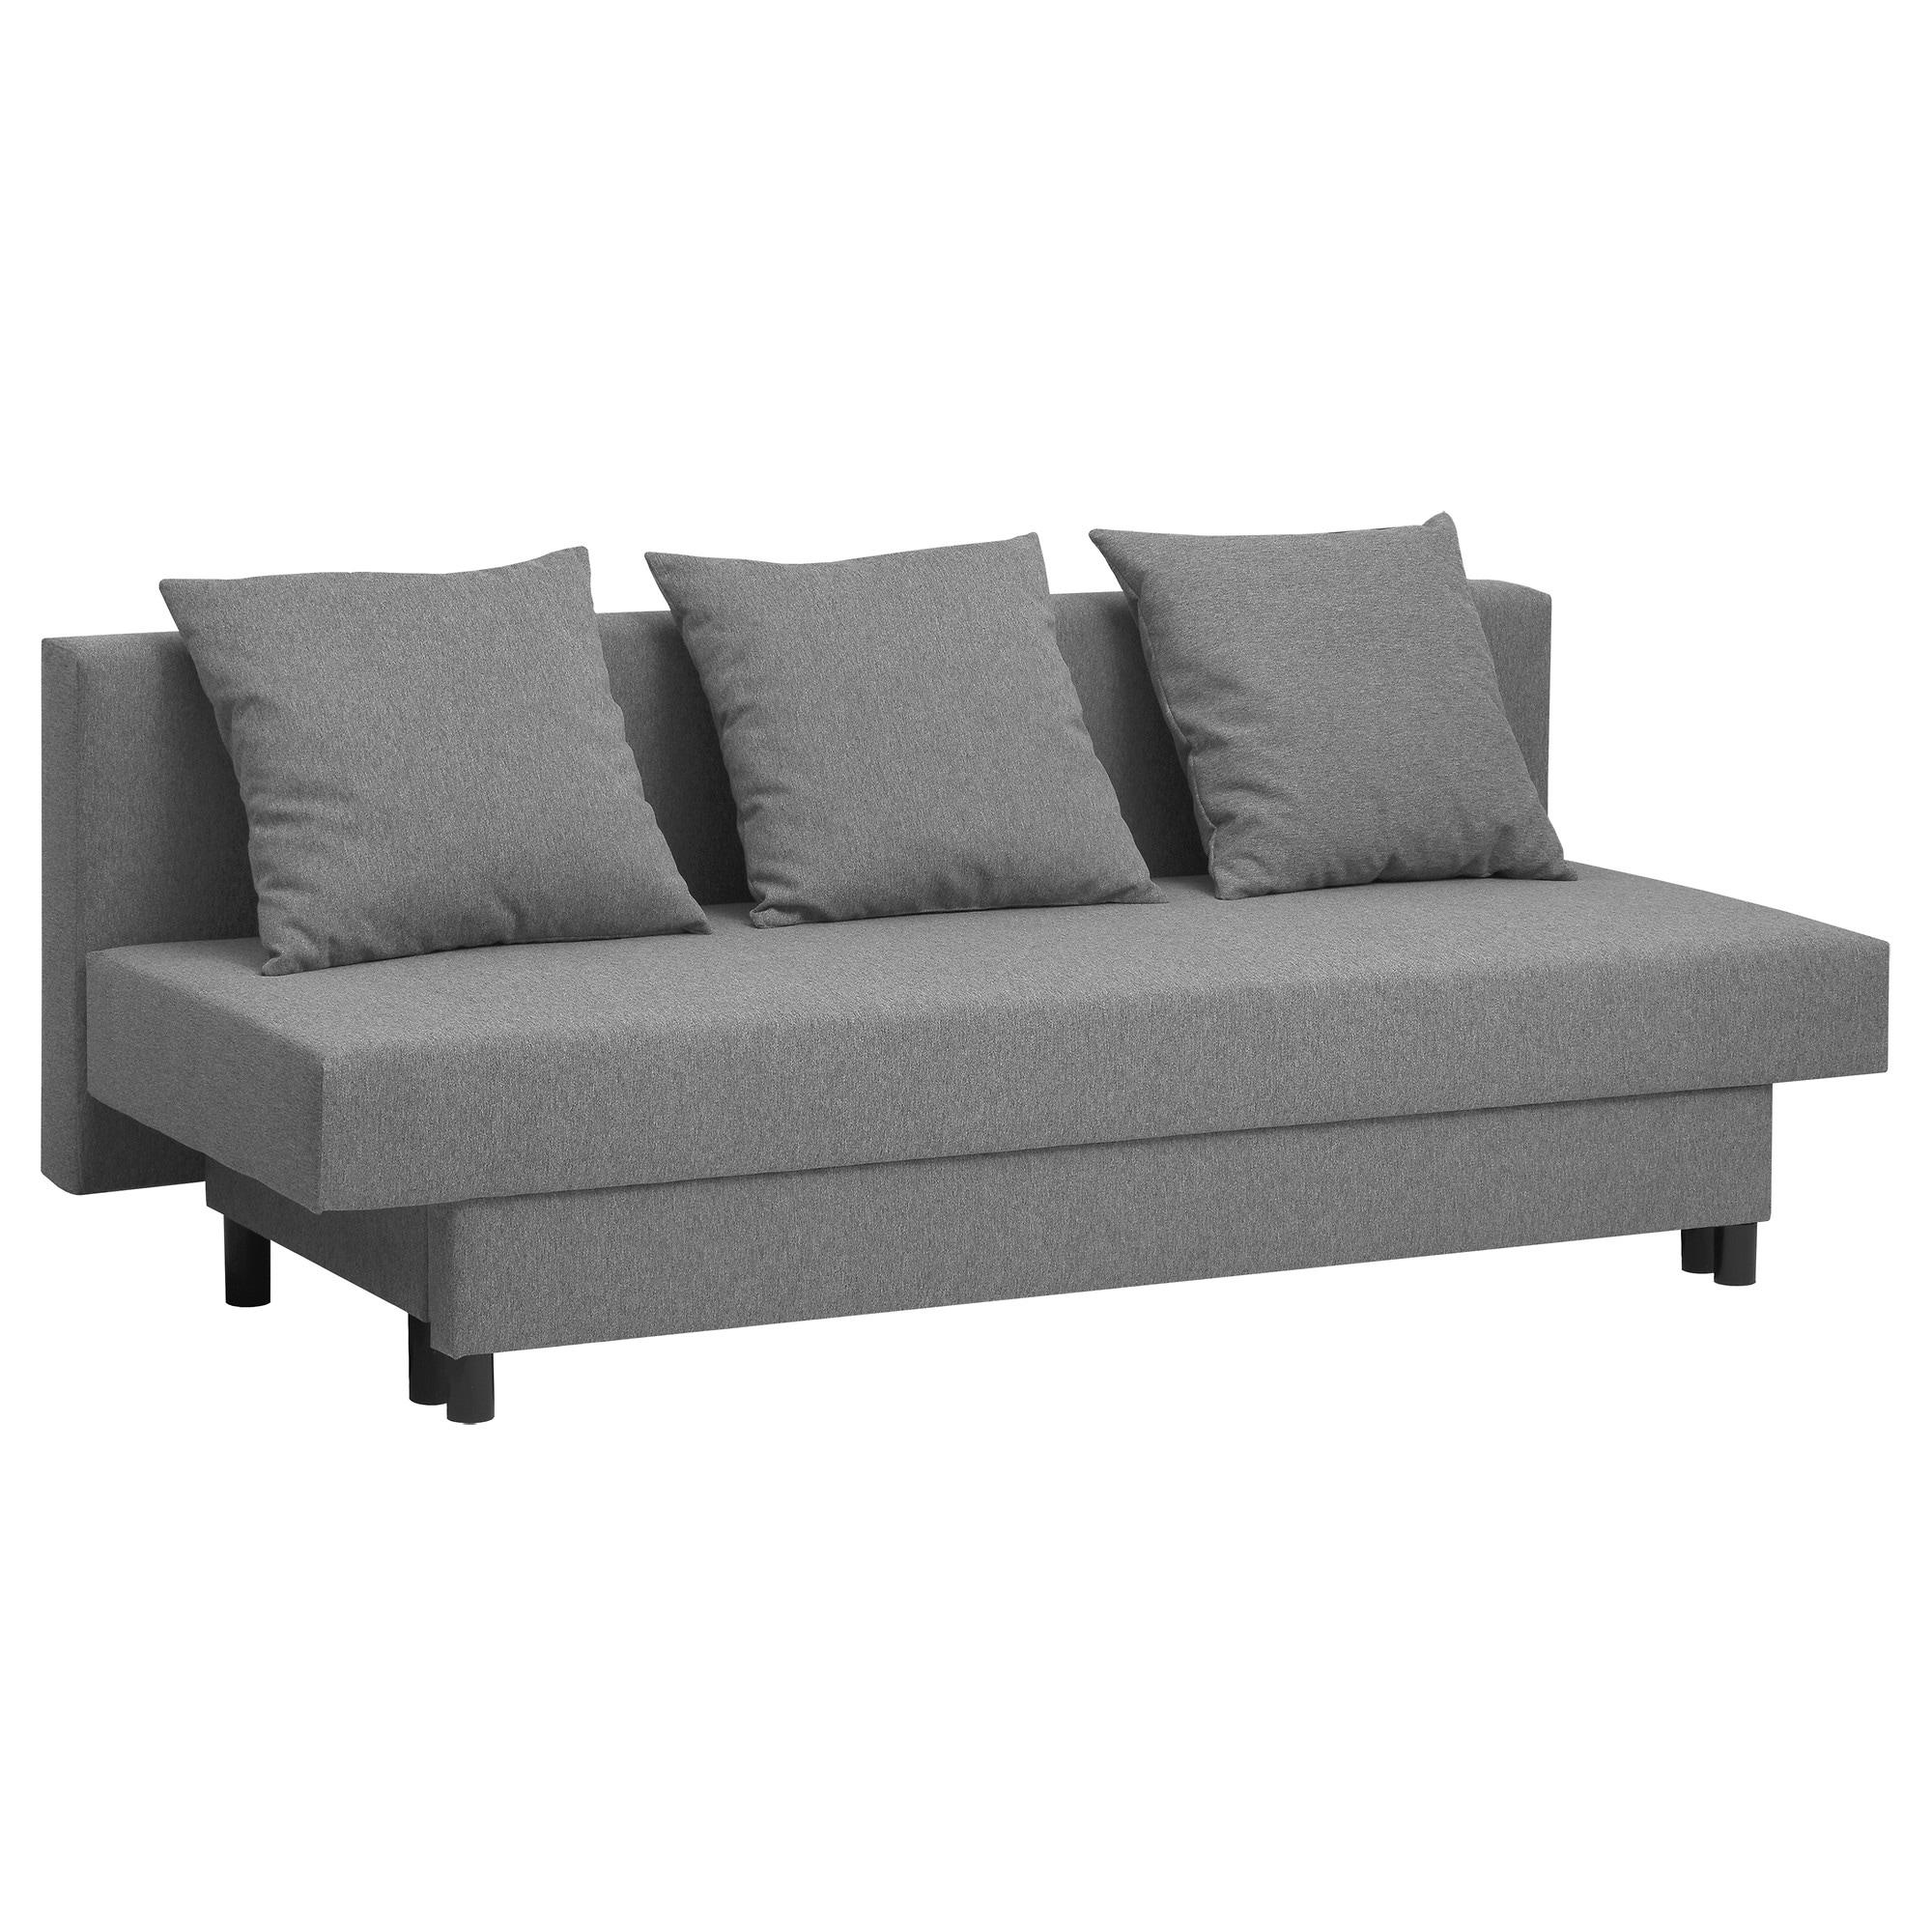 Sofa Cama De Ikea Y7du asarum Three Seat sofa Bed Grey Ikea